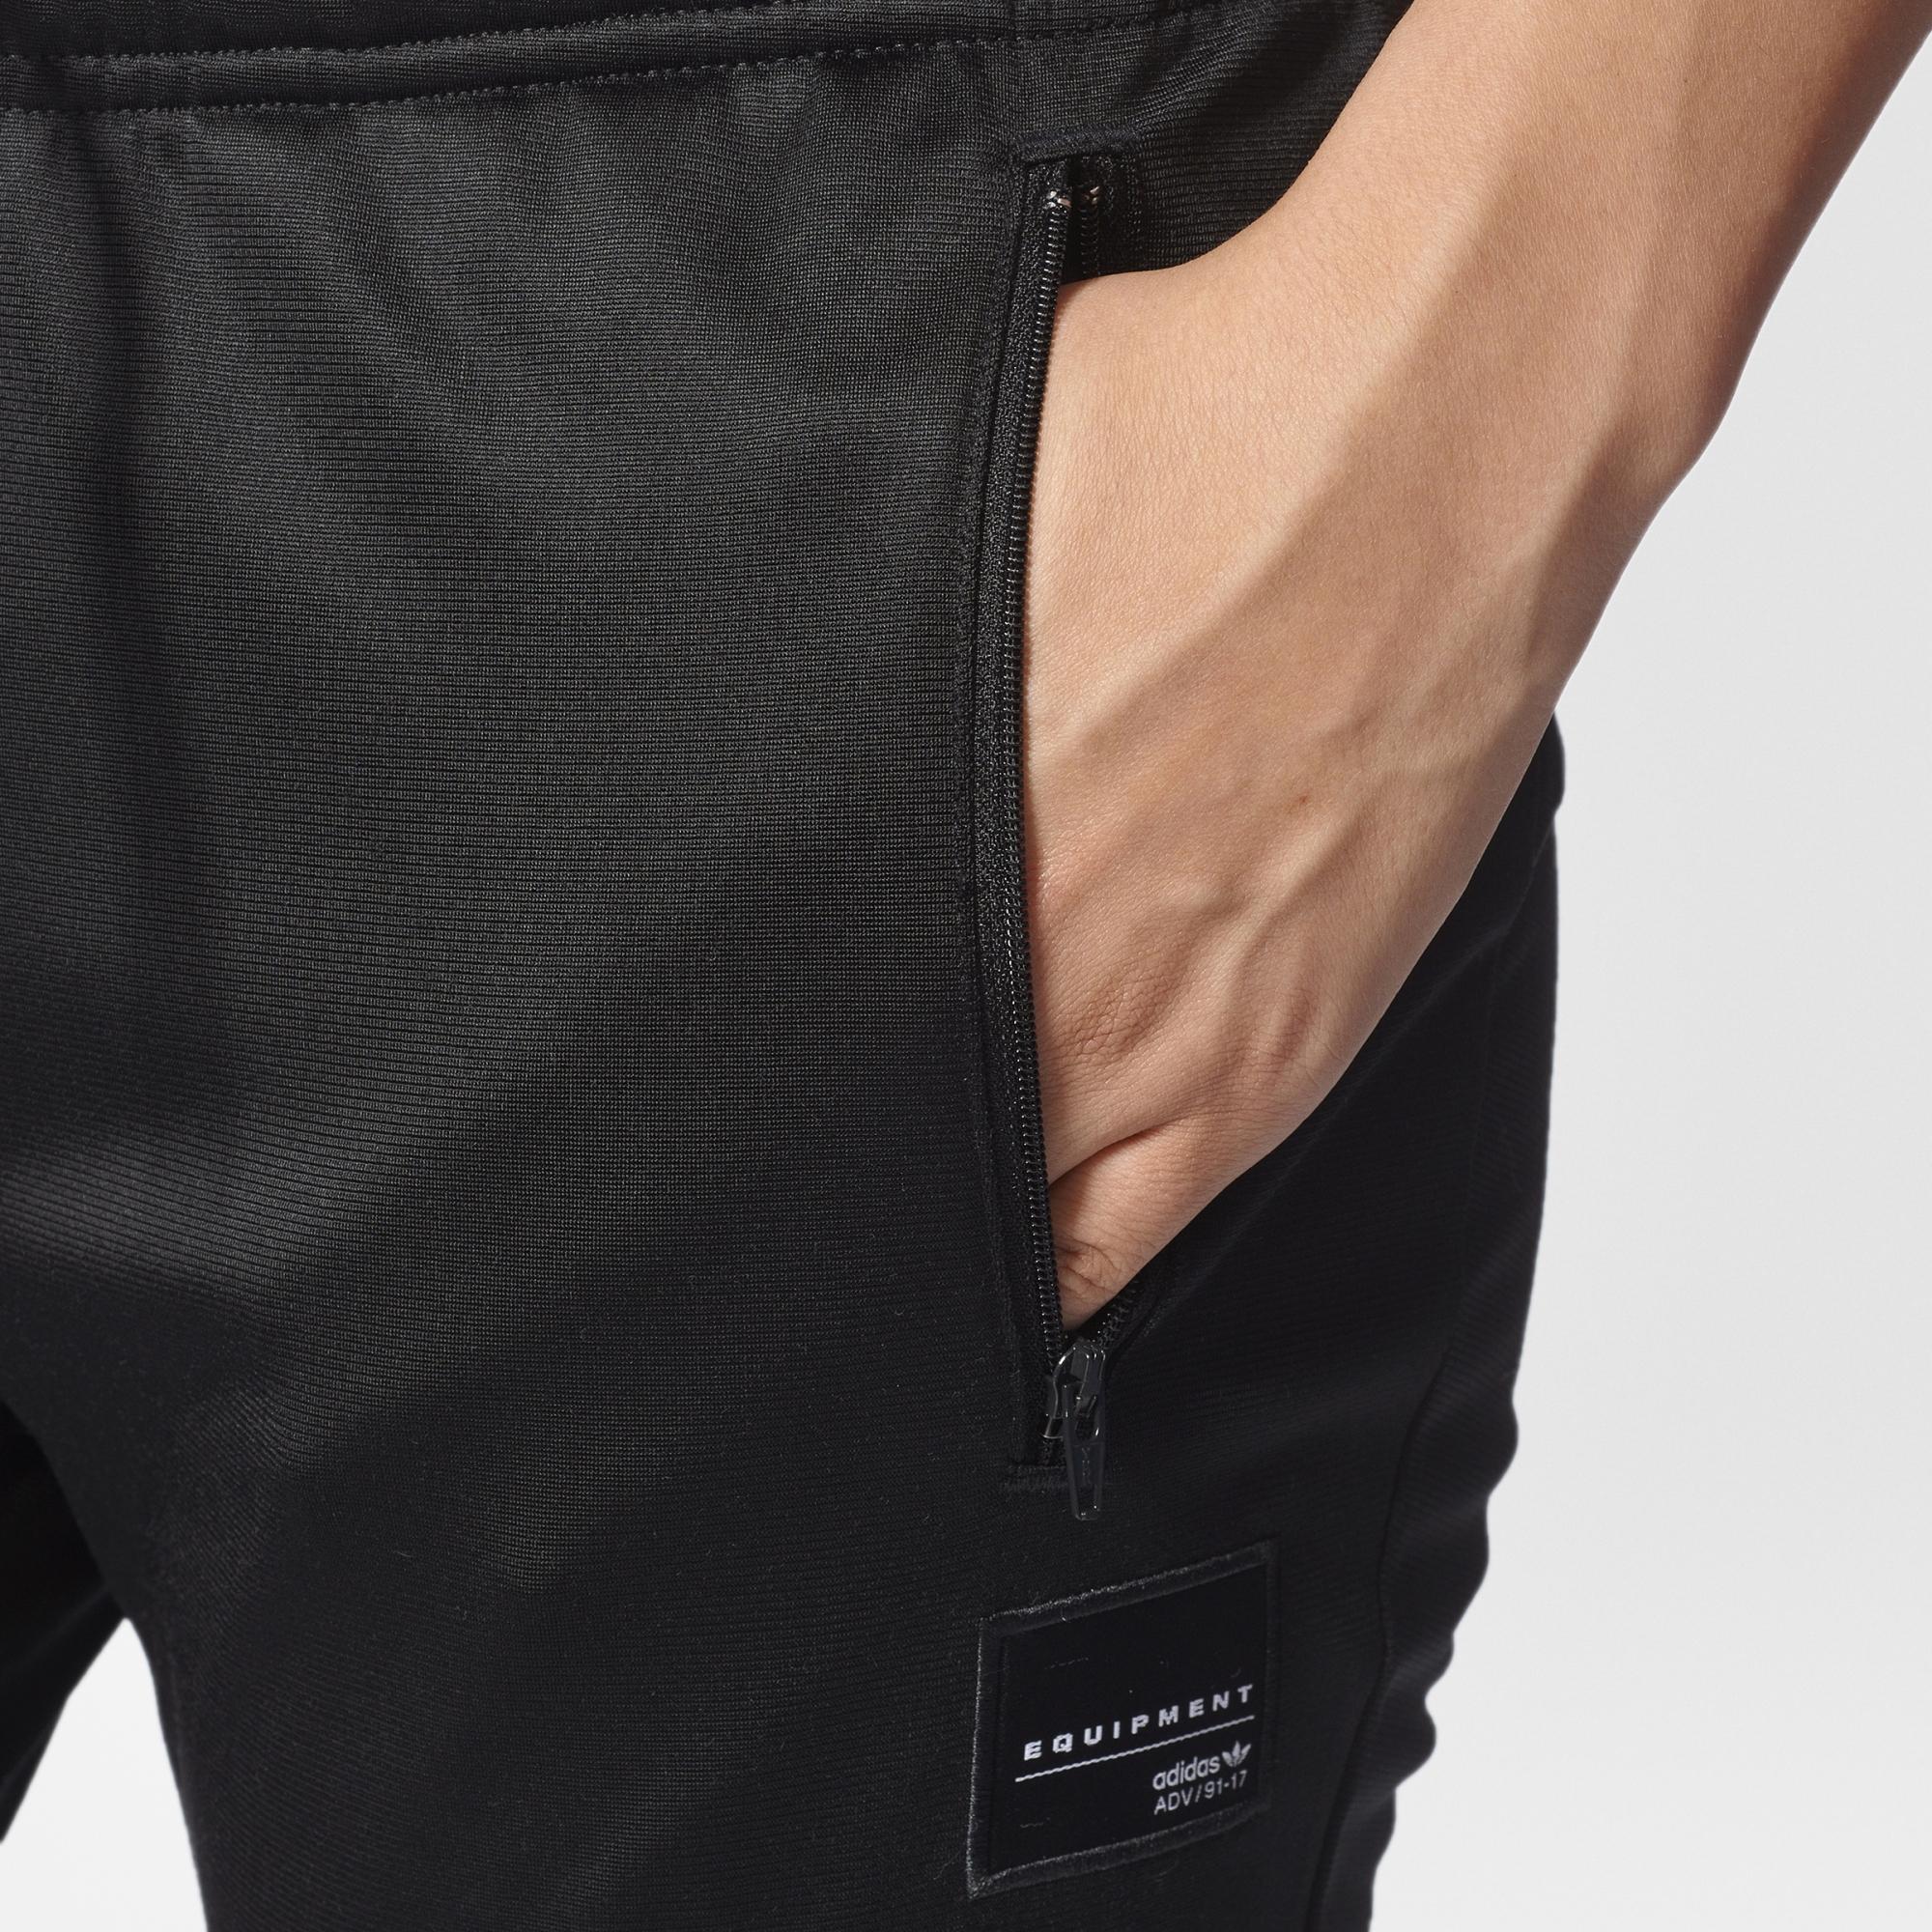 spodnie adidas EQT Cigarette Pants 34 BP9283